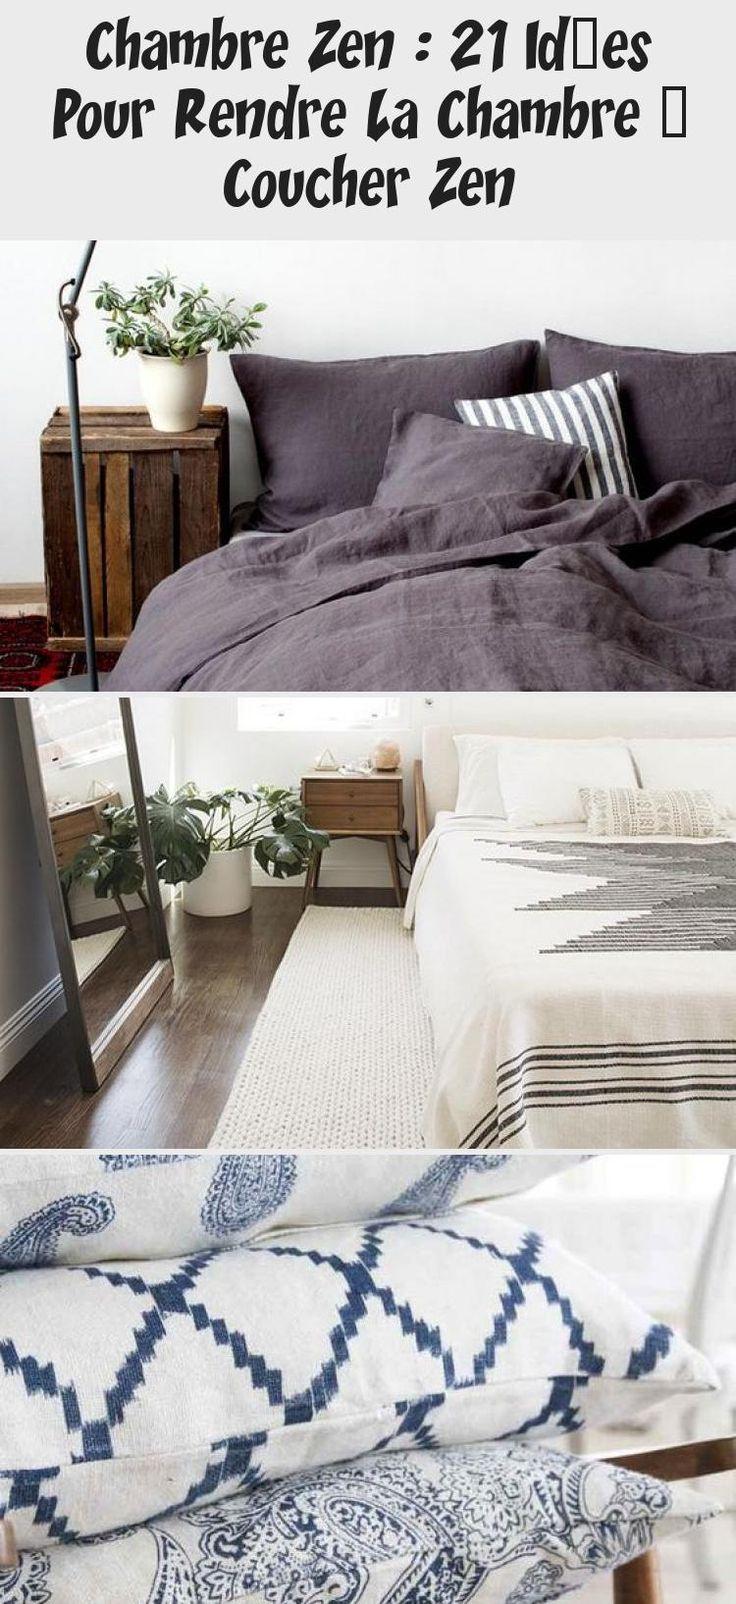 Favouritebeddings Bedroomdecorkids Bedroomdecorforwomen Bedroomdecorwhite Bedroomdecorpictu Bedroom Decor For Women Zen Bedroom Bedroom Decor Pictures